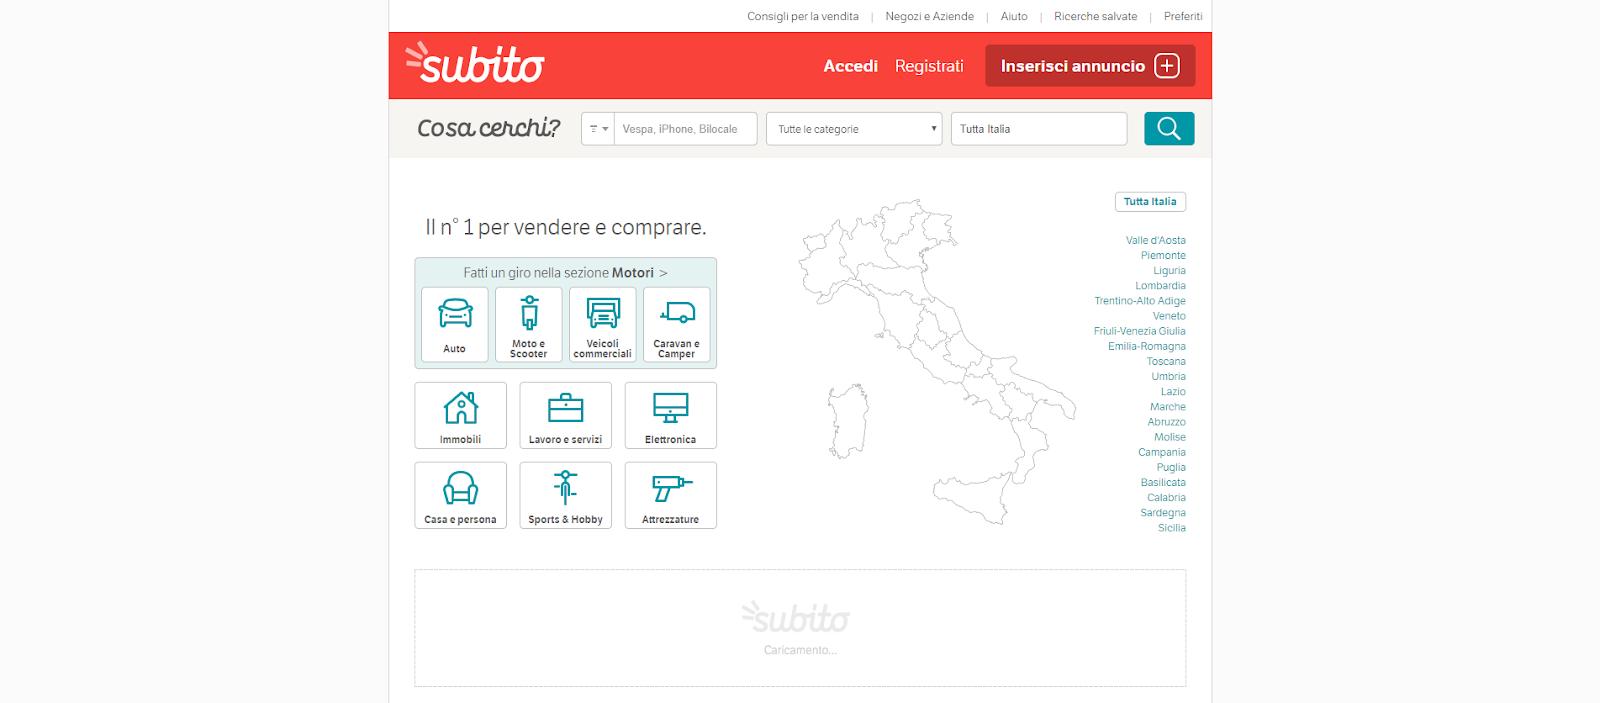 Subito Gamification landingpage